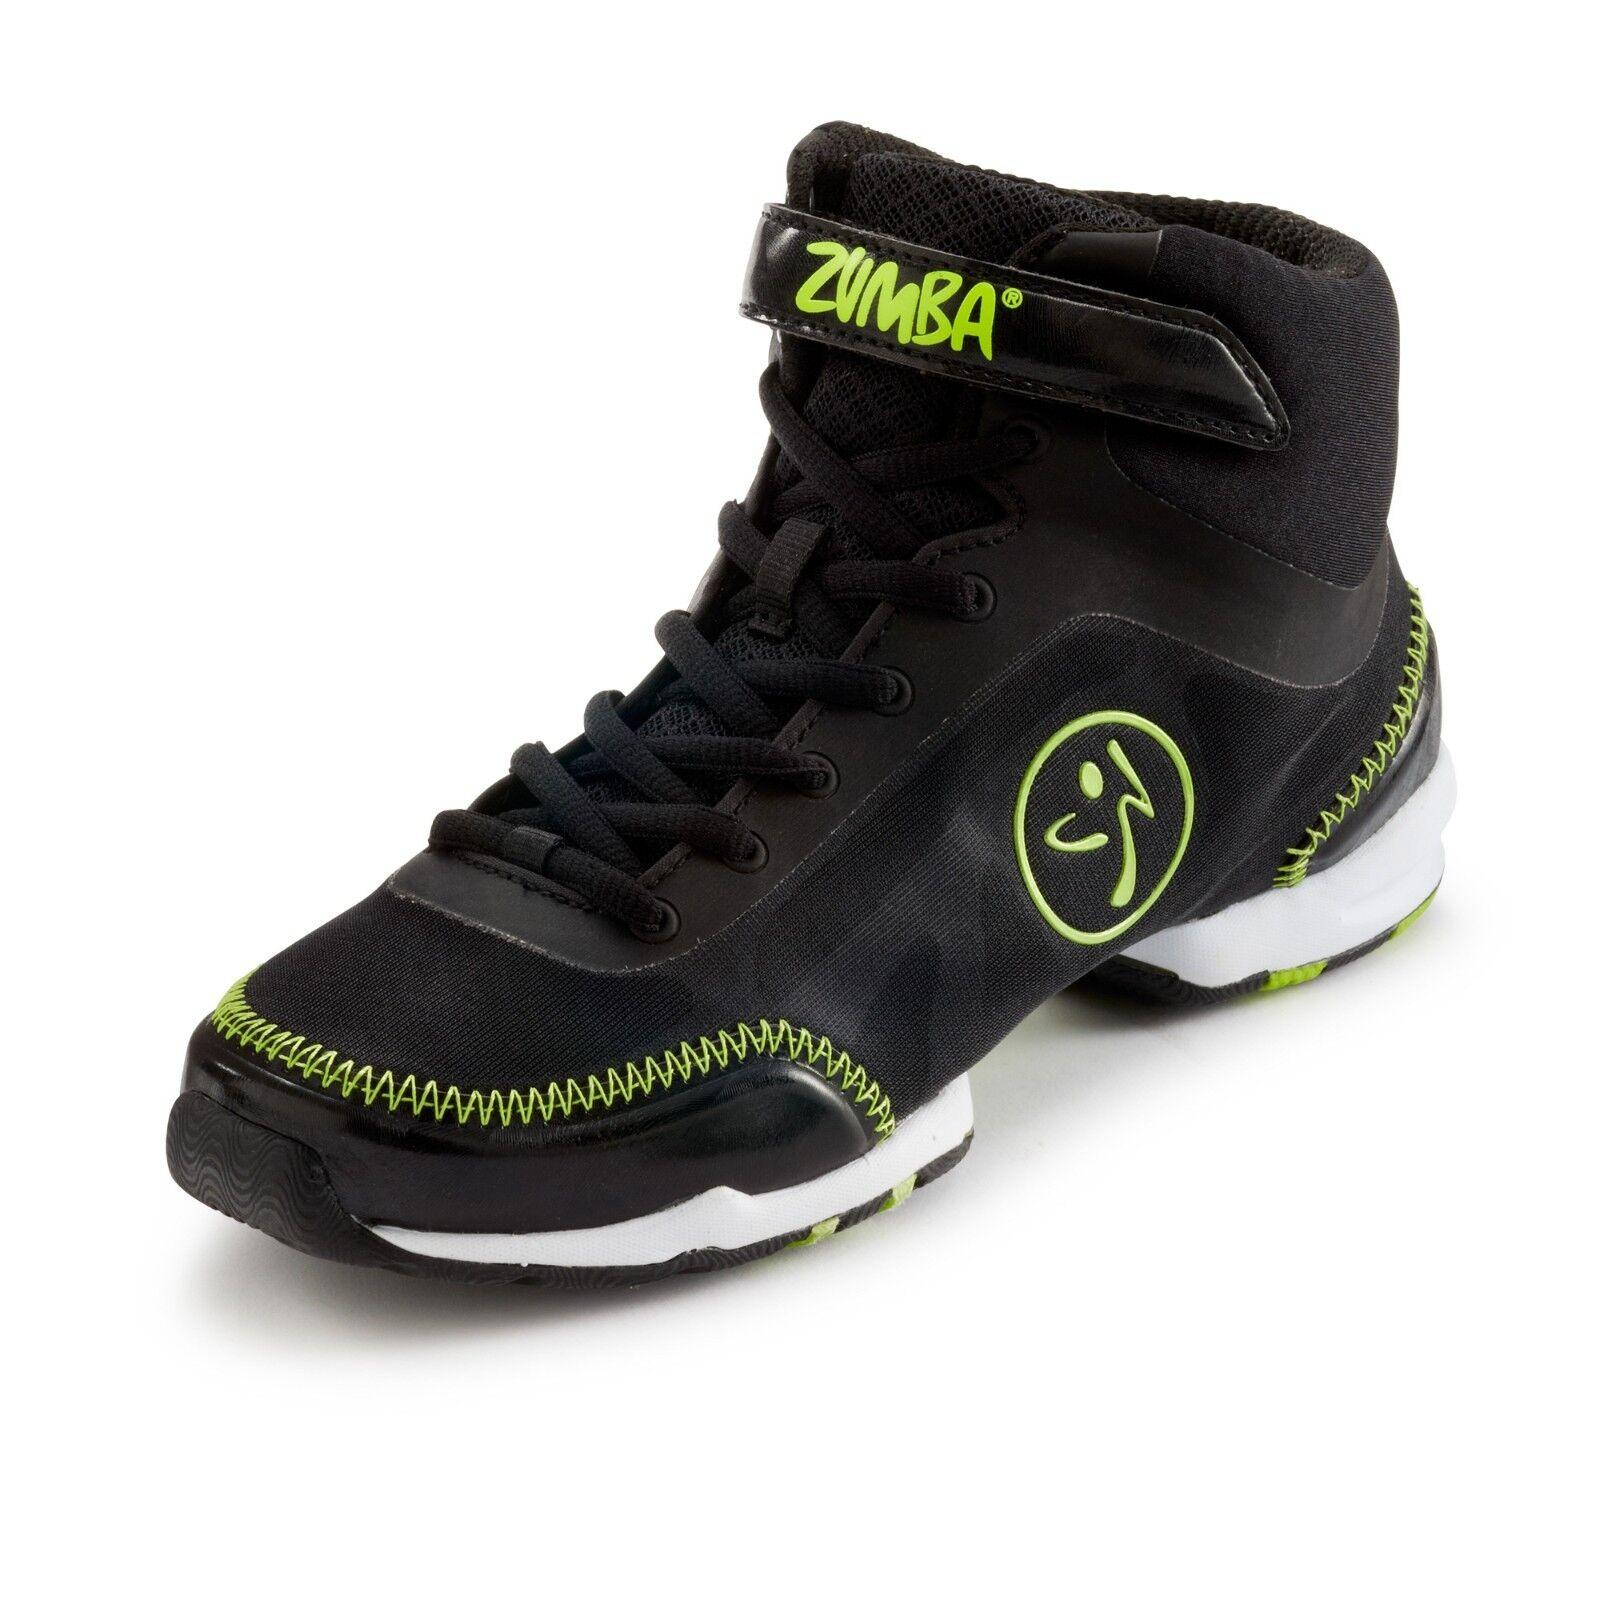 ZUMBA Flex Classic HIGH TOP Schuhe TRAINERS HIP HOP Top DANCE  - Zumba's Top HOP Line c723c2